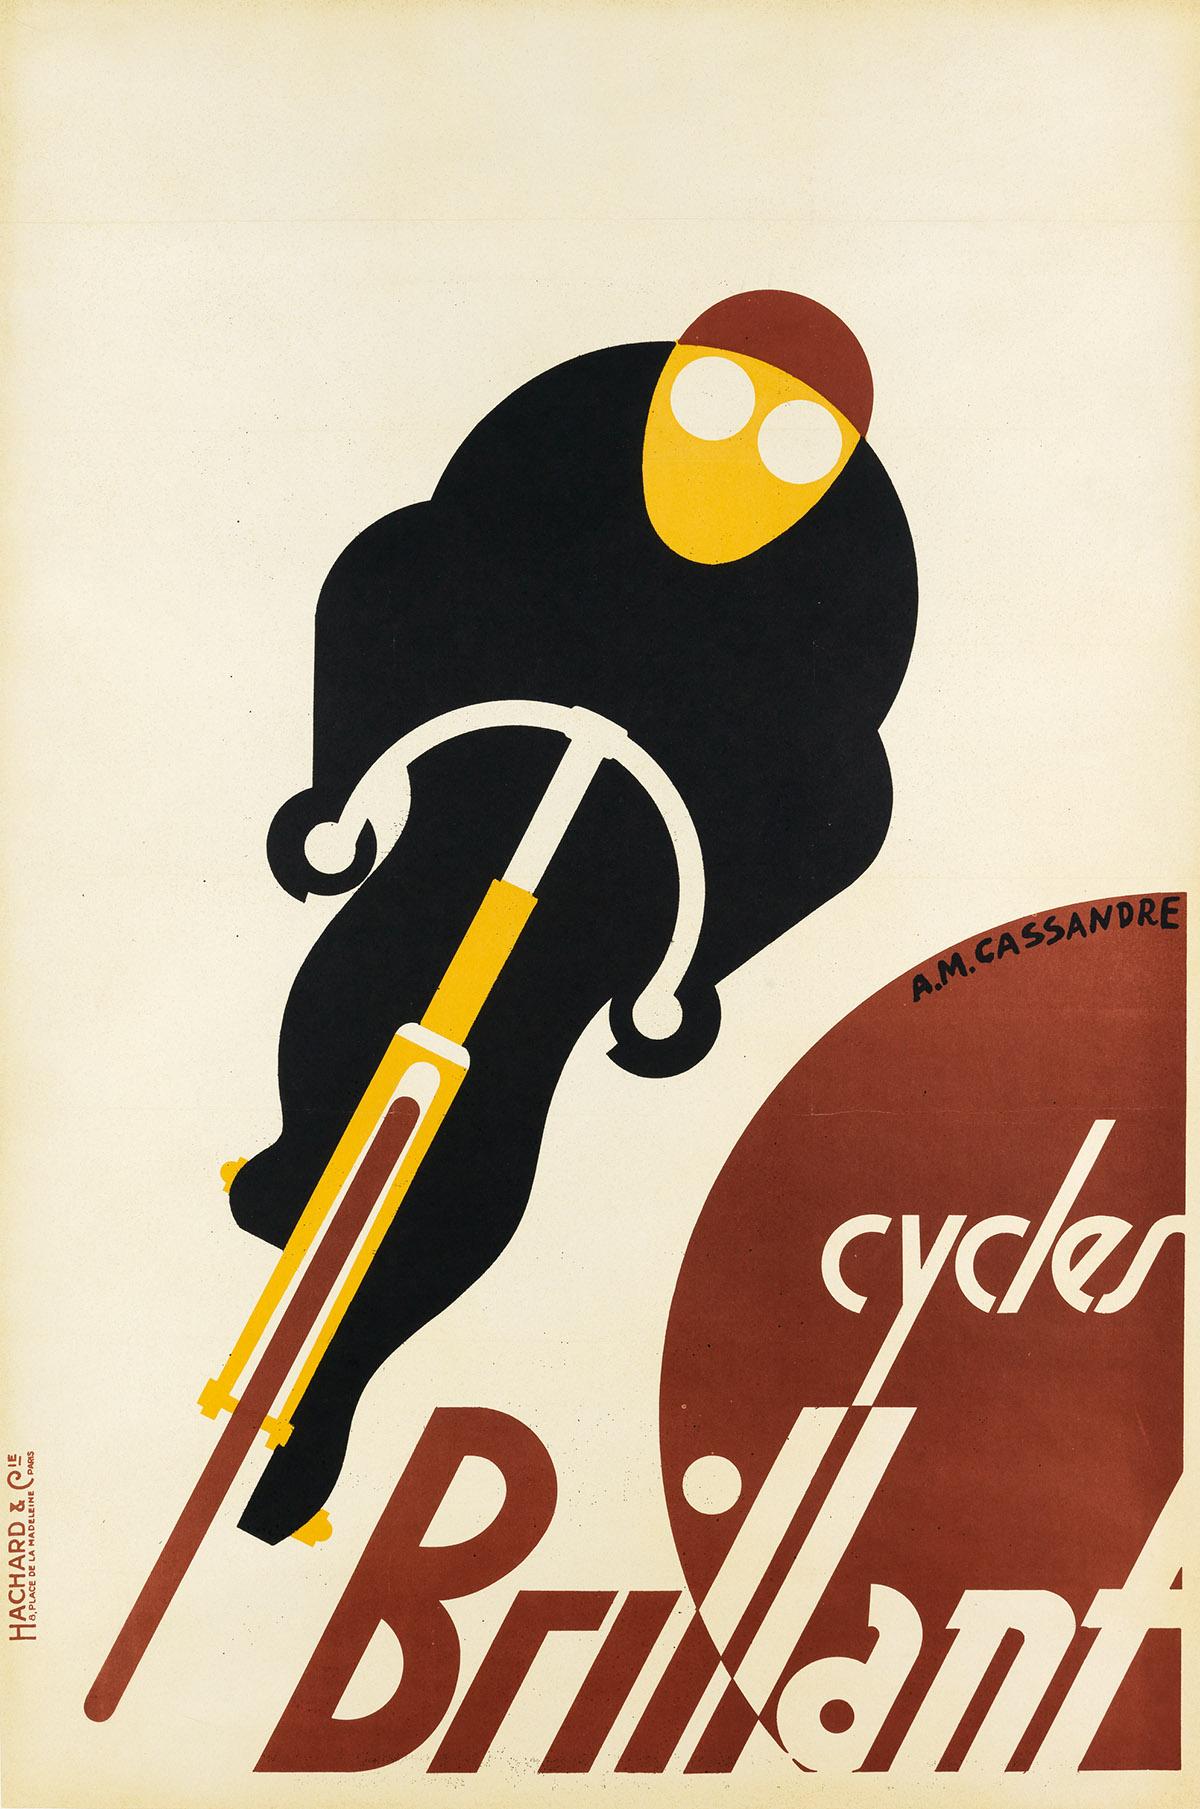 ADOLPHE-MOURON-CASSANDRE-(1901-1968)-CYCLES-BRILLANT-1925-46